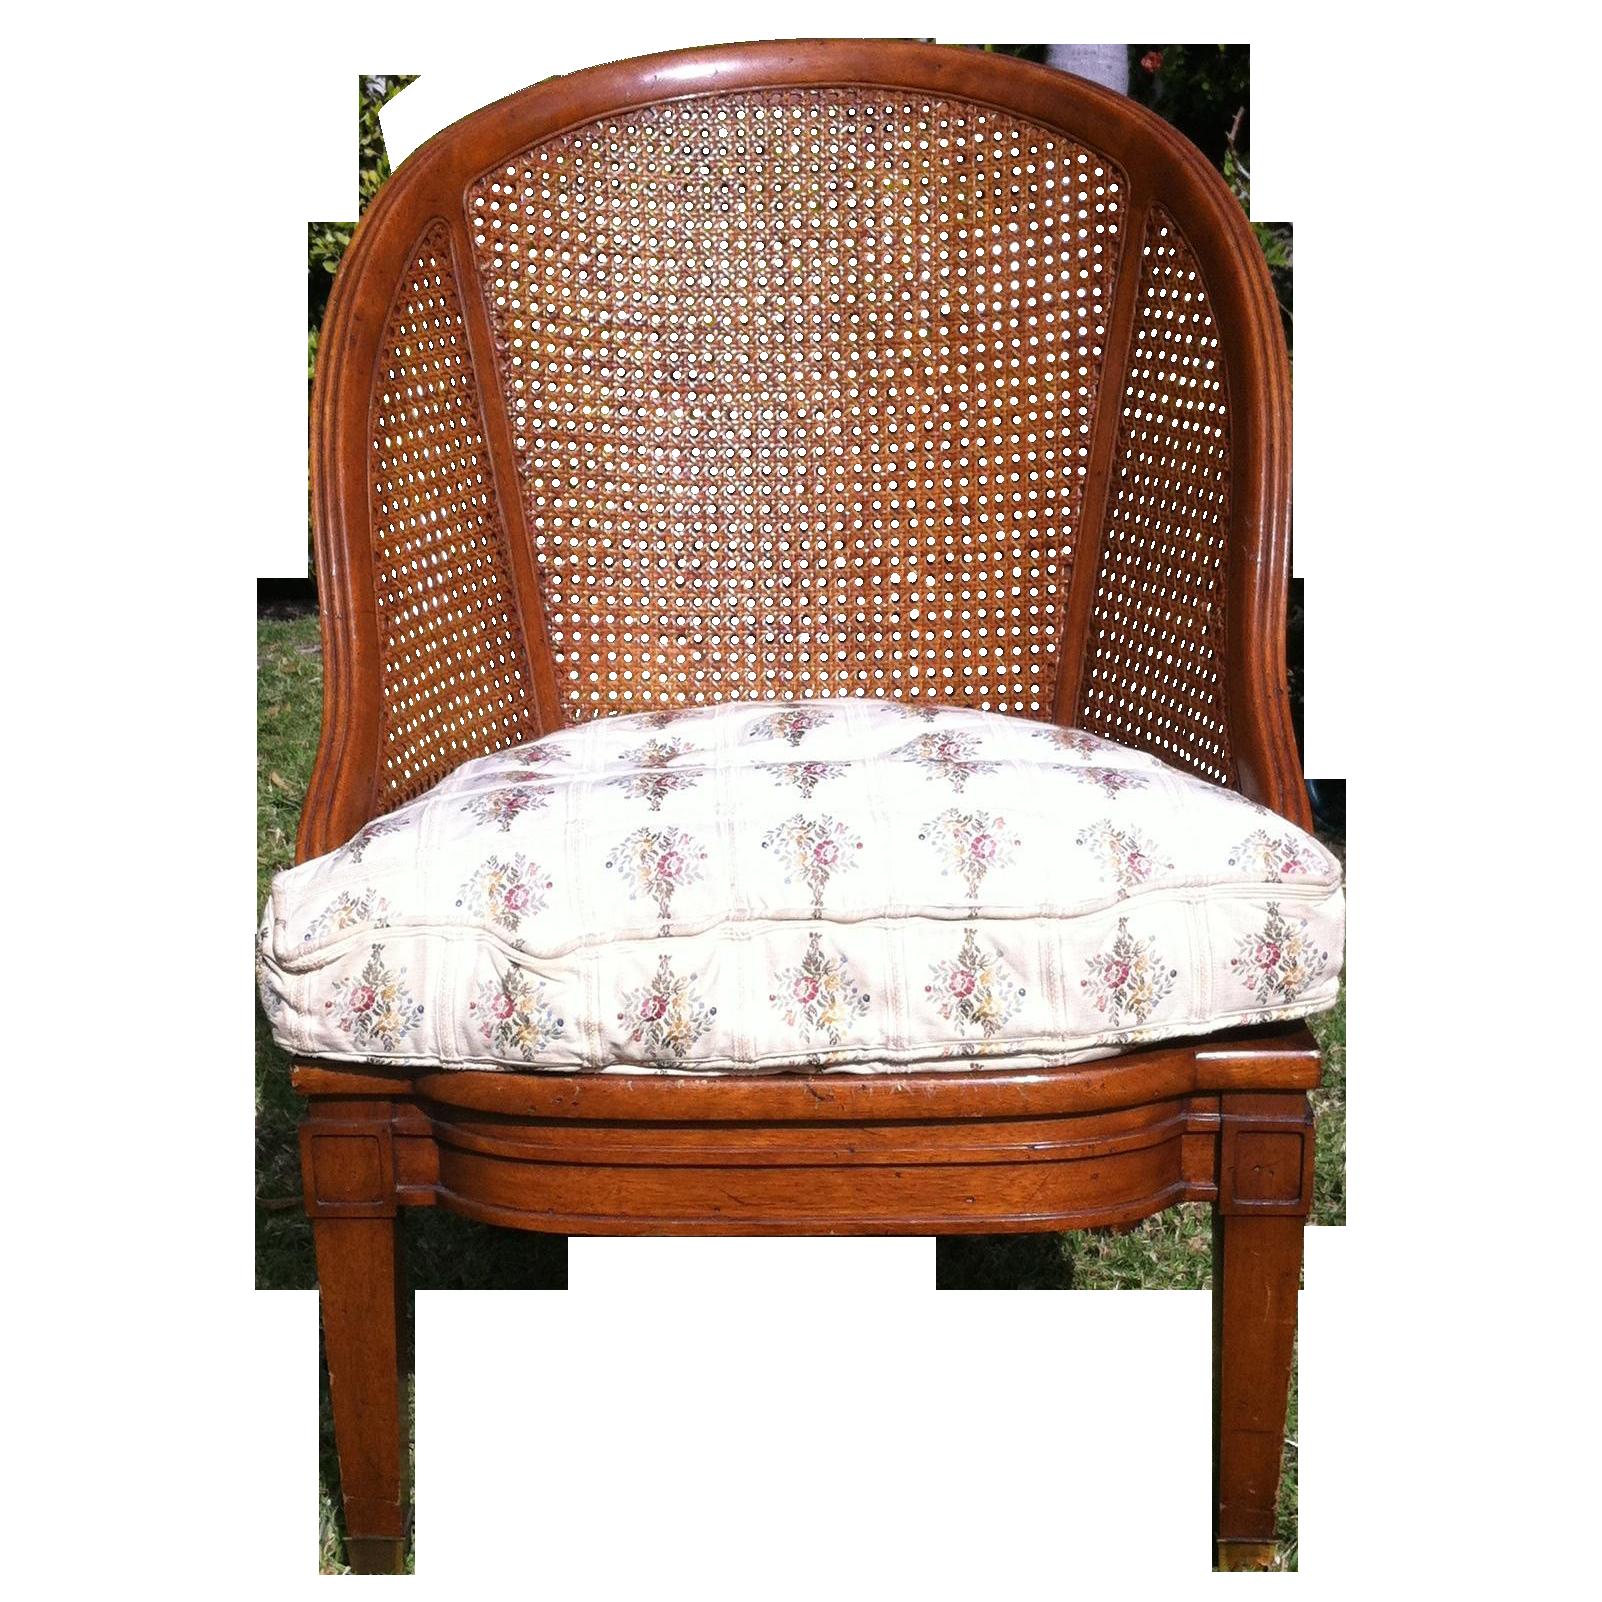 Henredon Schoonbeck Cane Back Barrel Chair